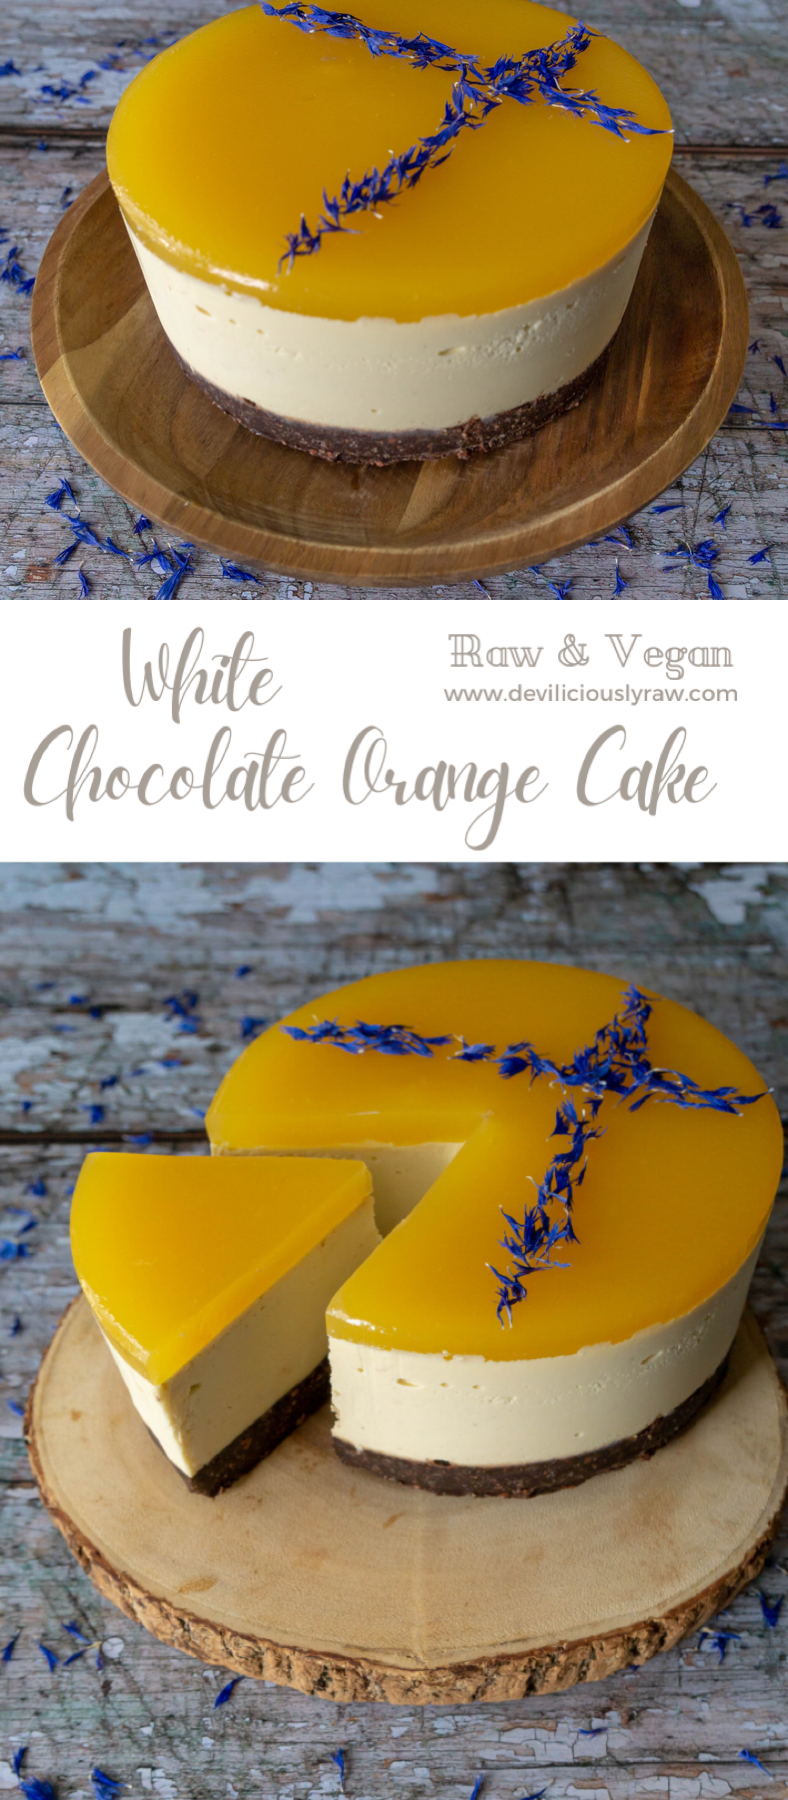 White Chocolate Orange Cake